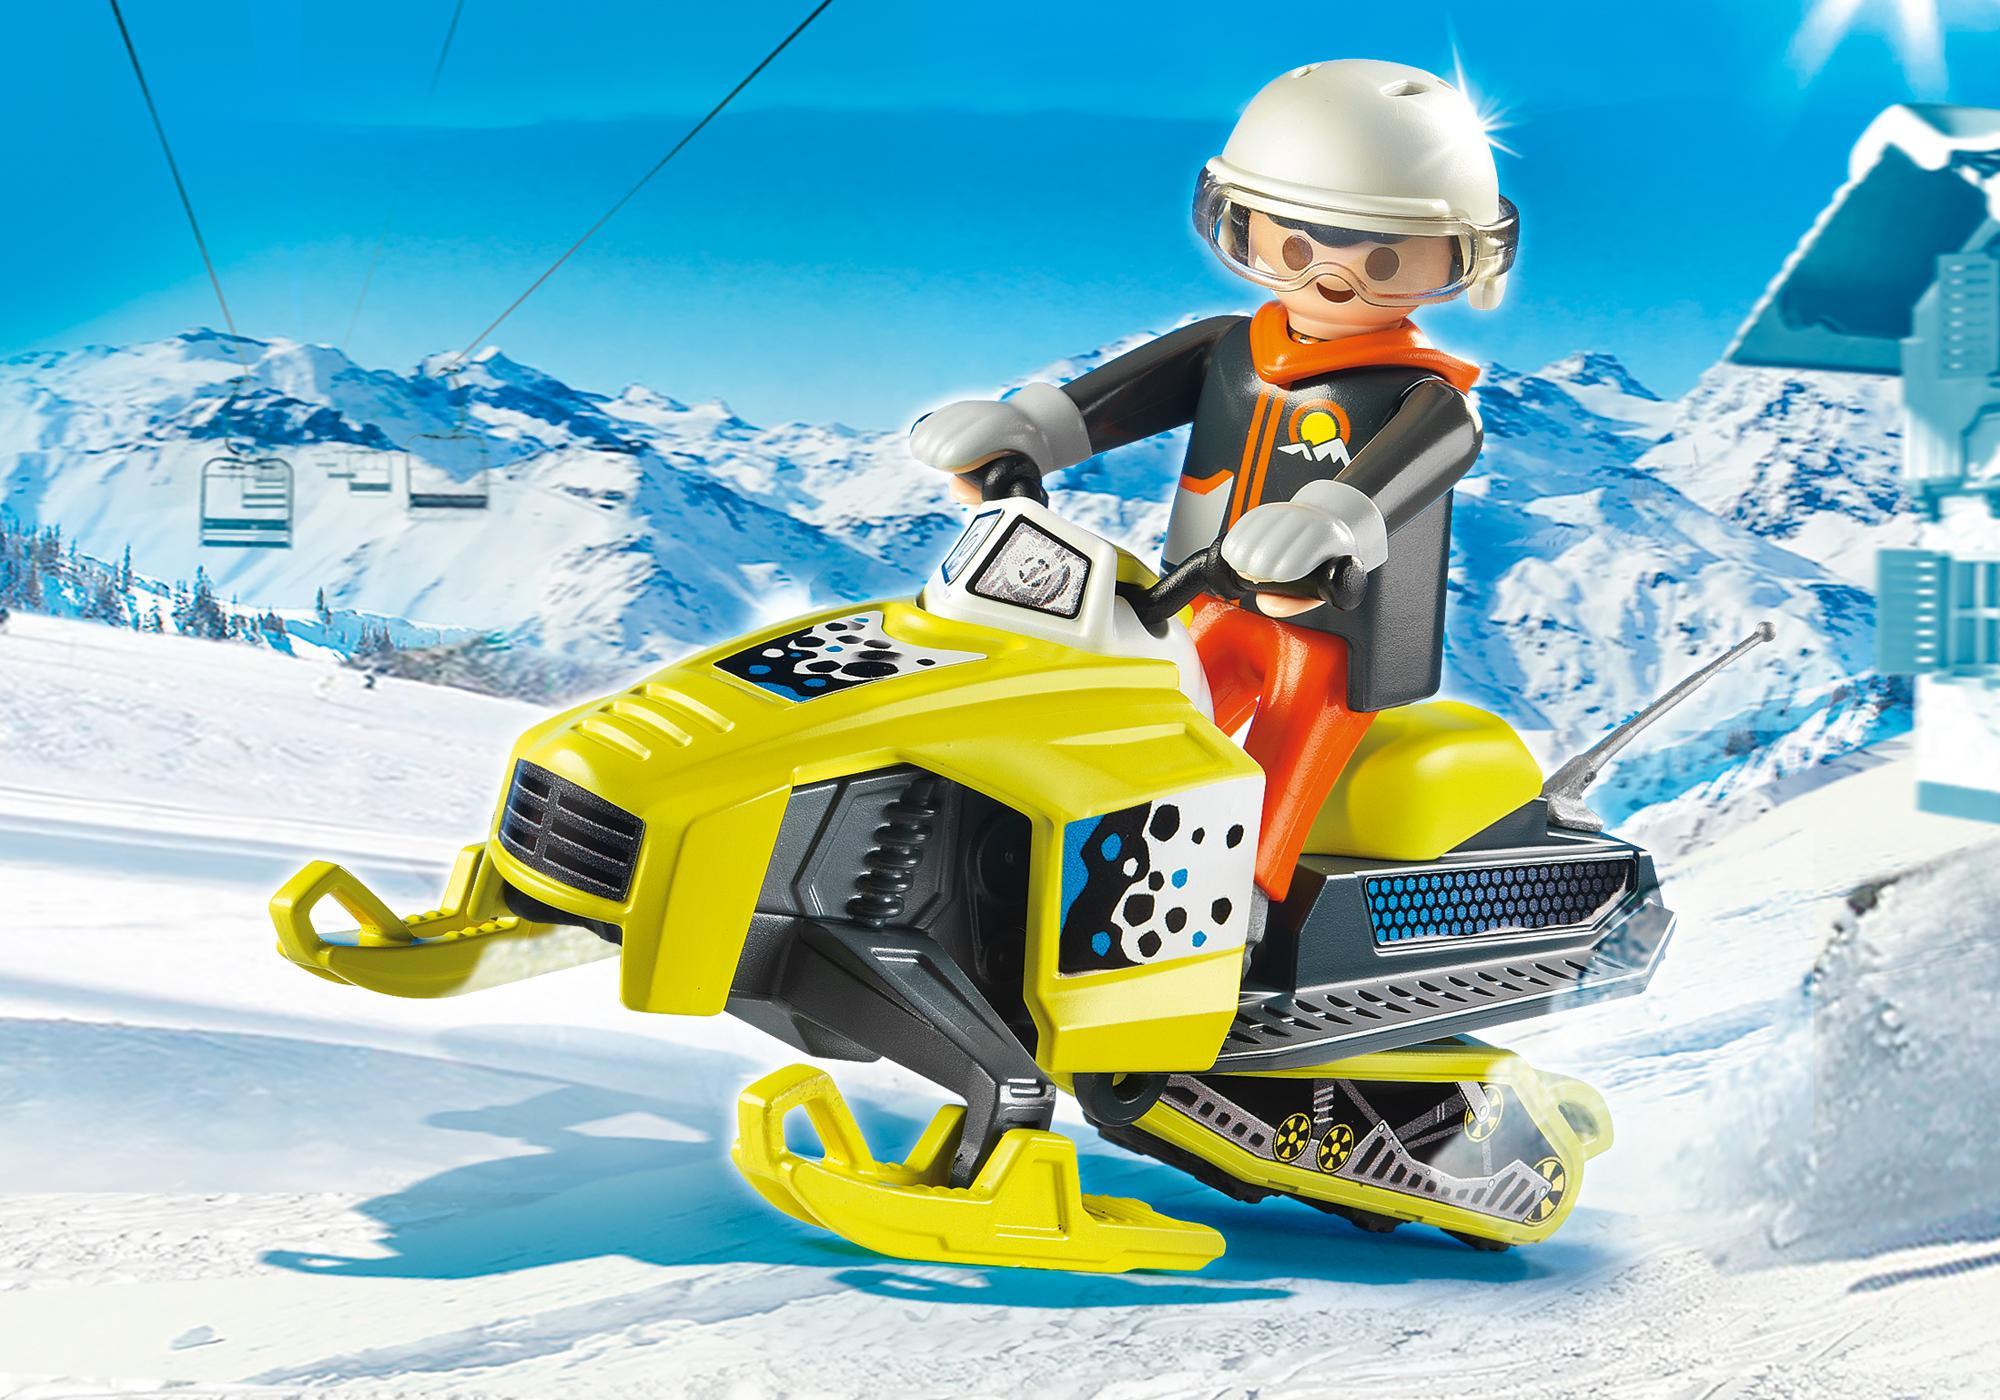 http://media.playmobil.com/i/playmobil/9285_product_detail/Motoslitta